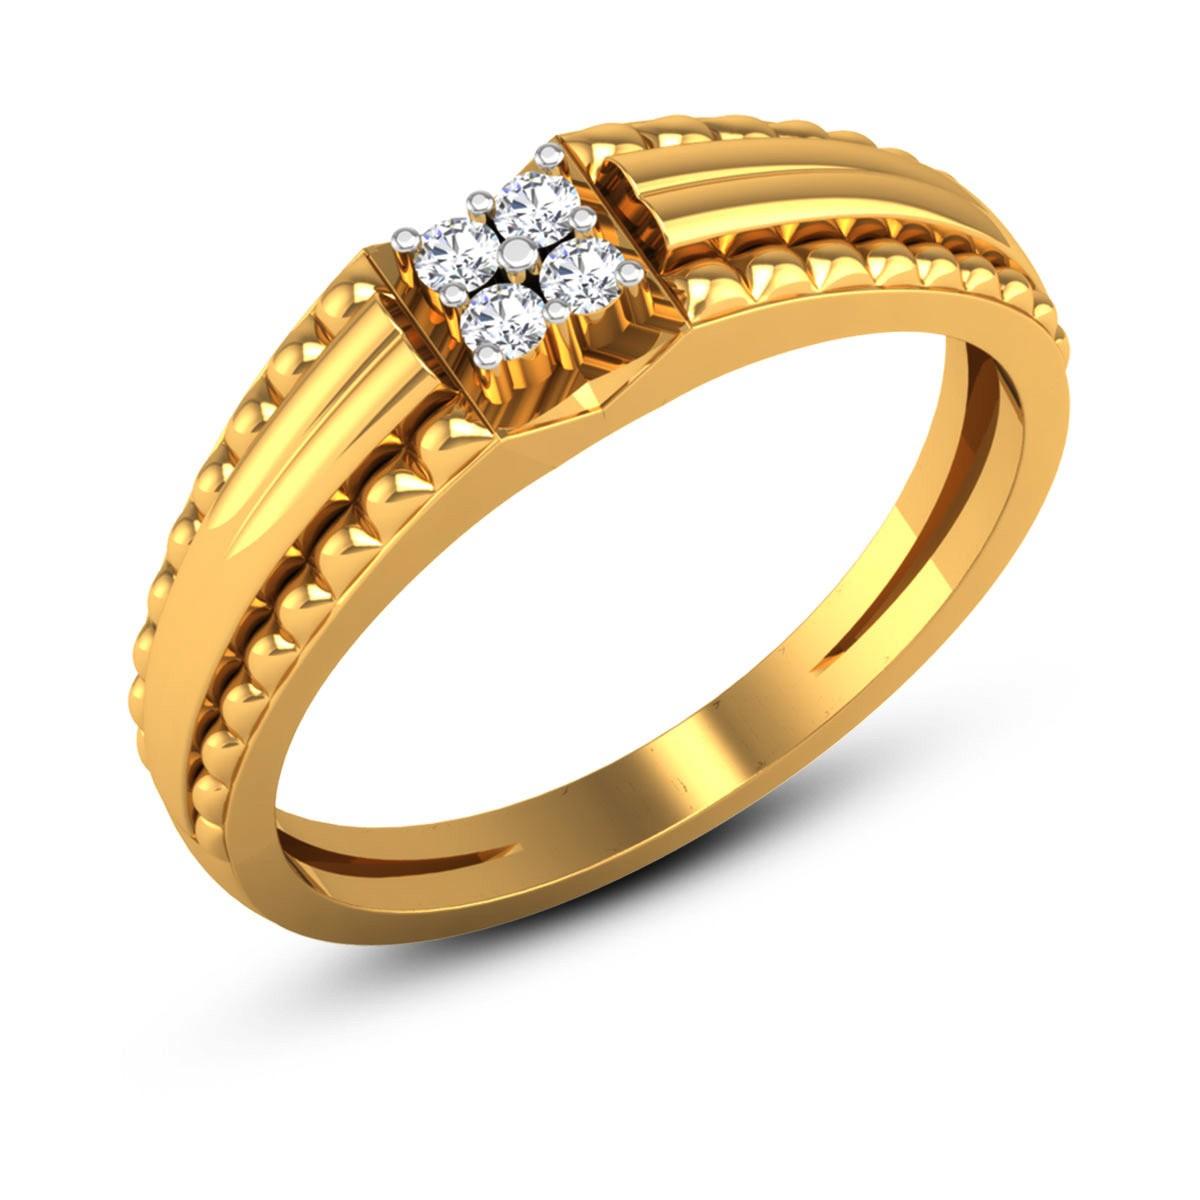 Aasit 4 Stone Diamond Ring